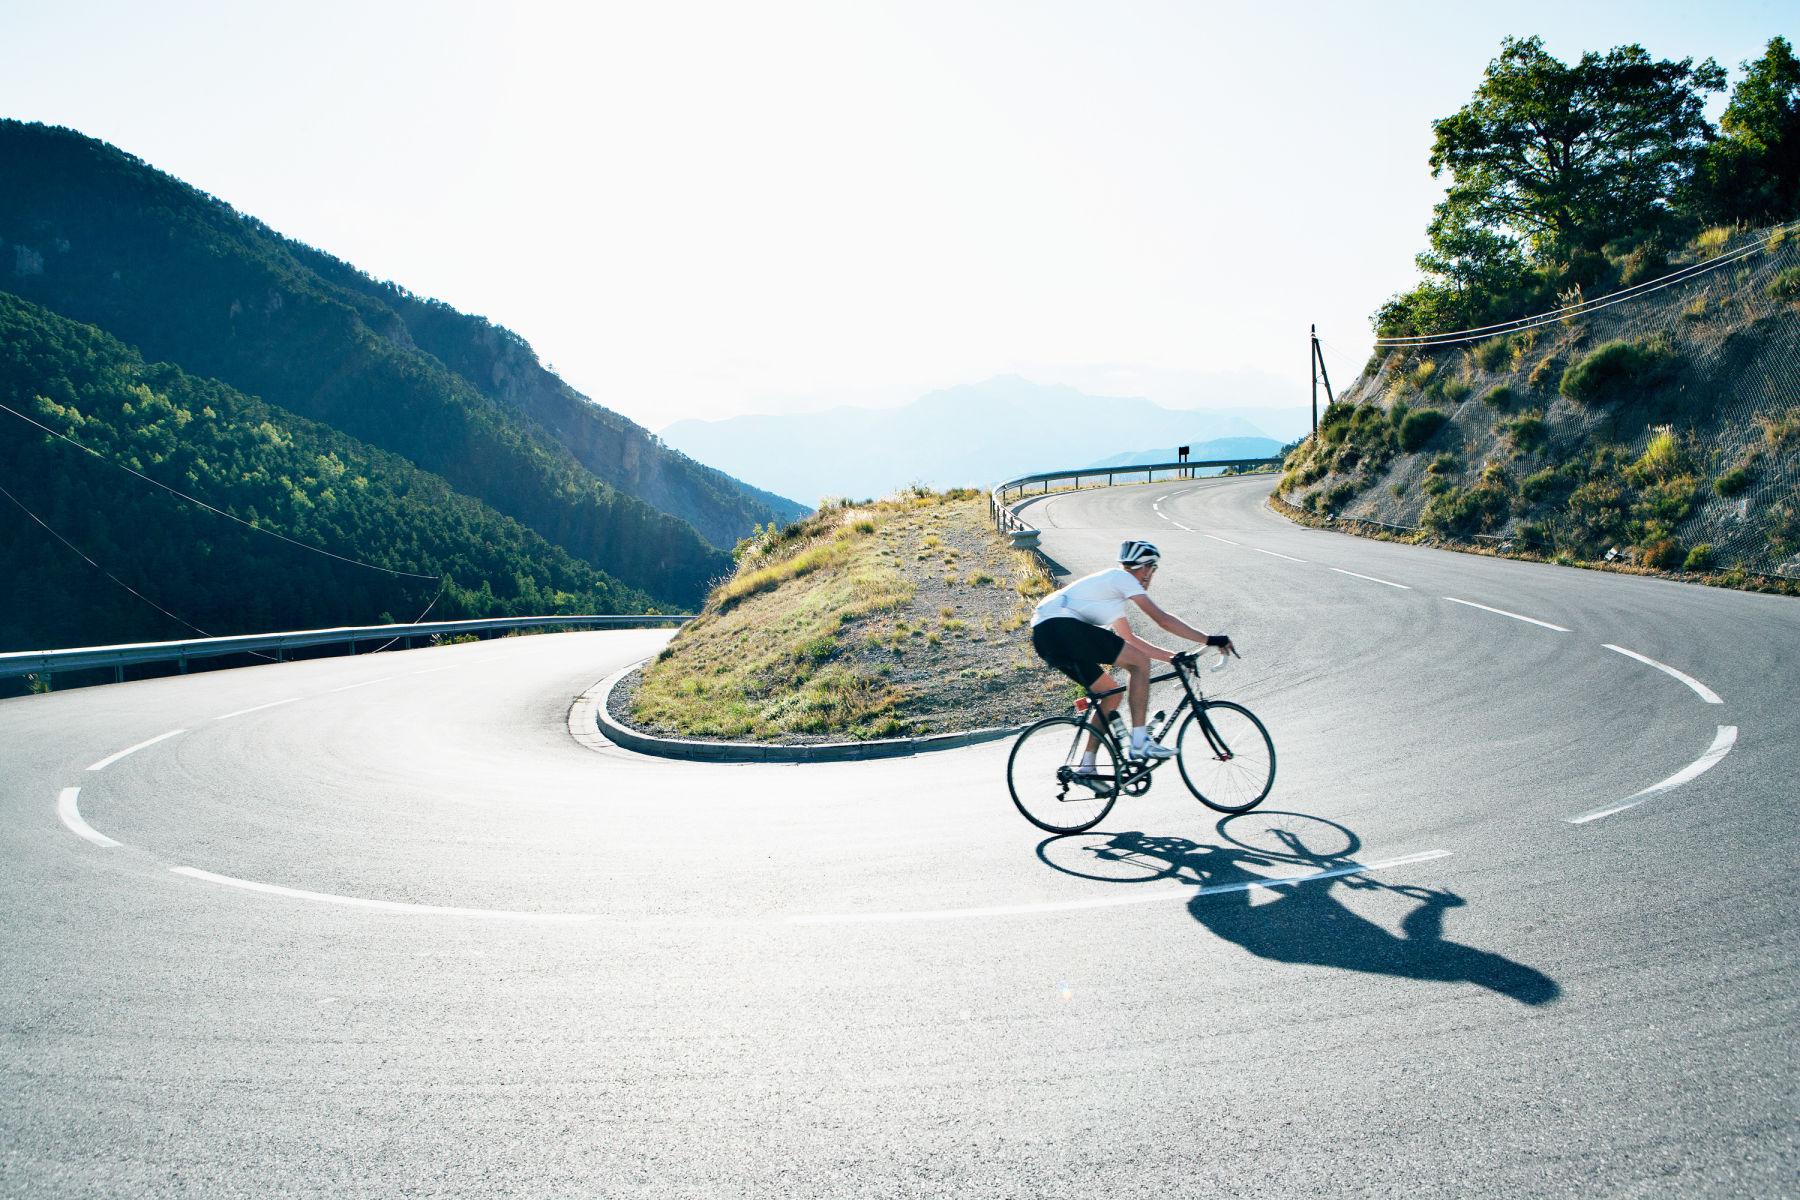 Paul-Calver-goodfromyou-9-Cyclist.jpg